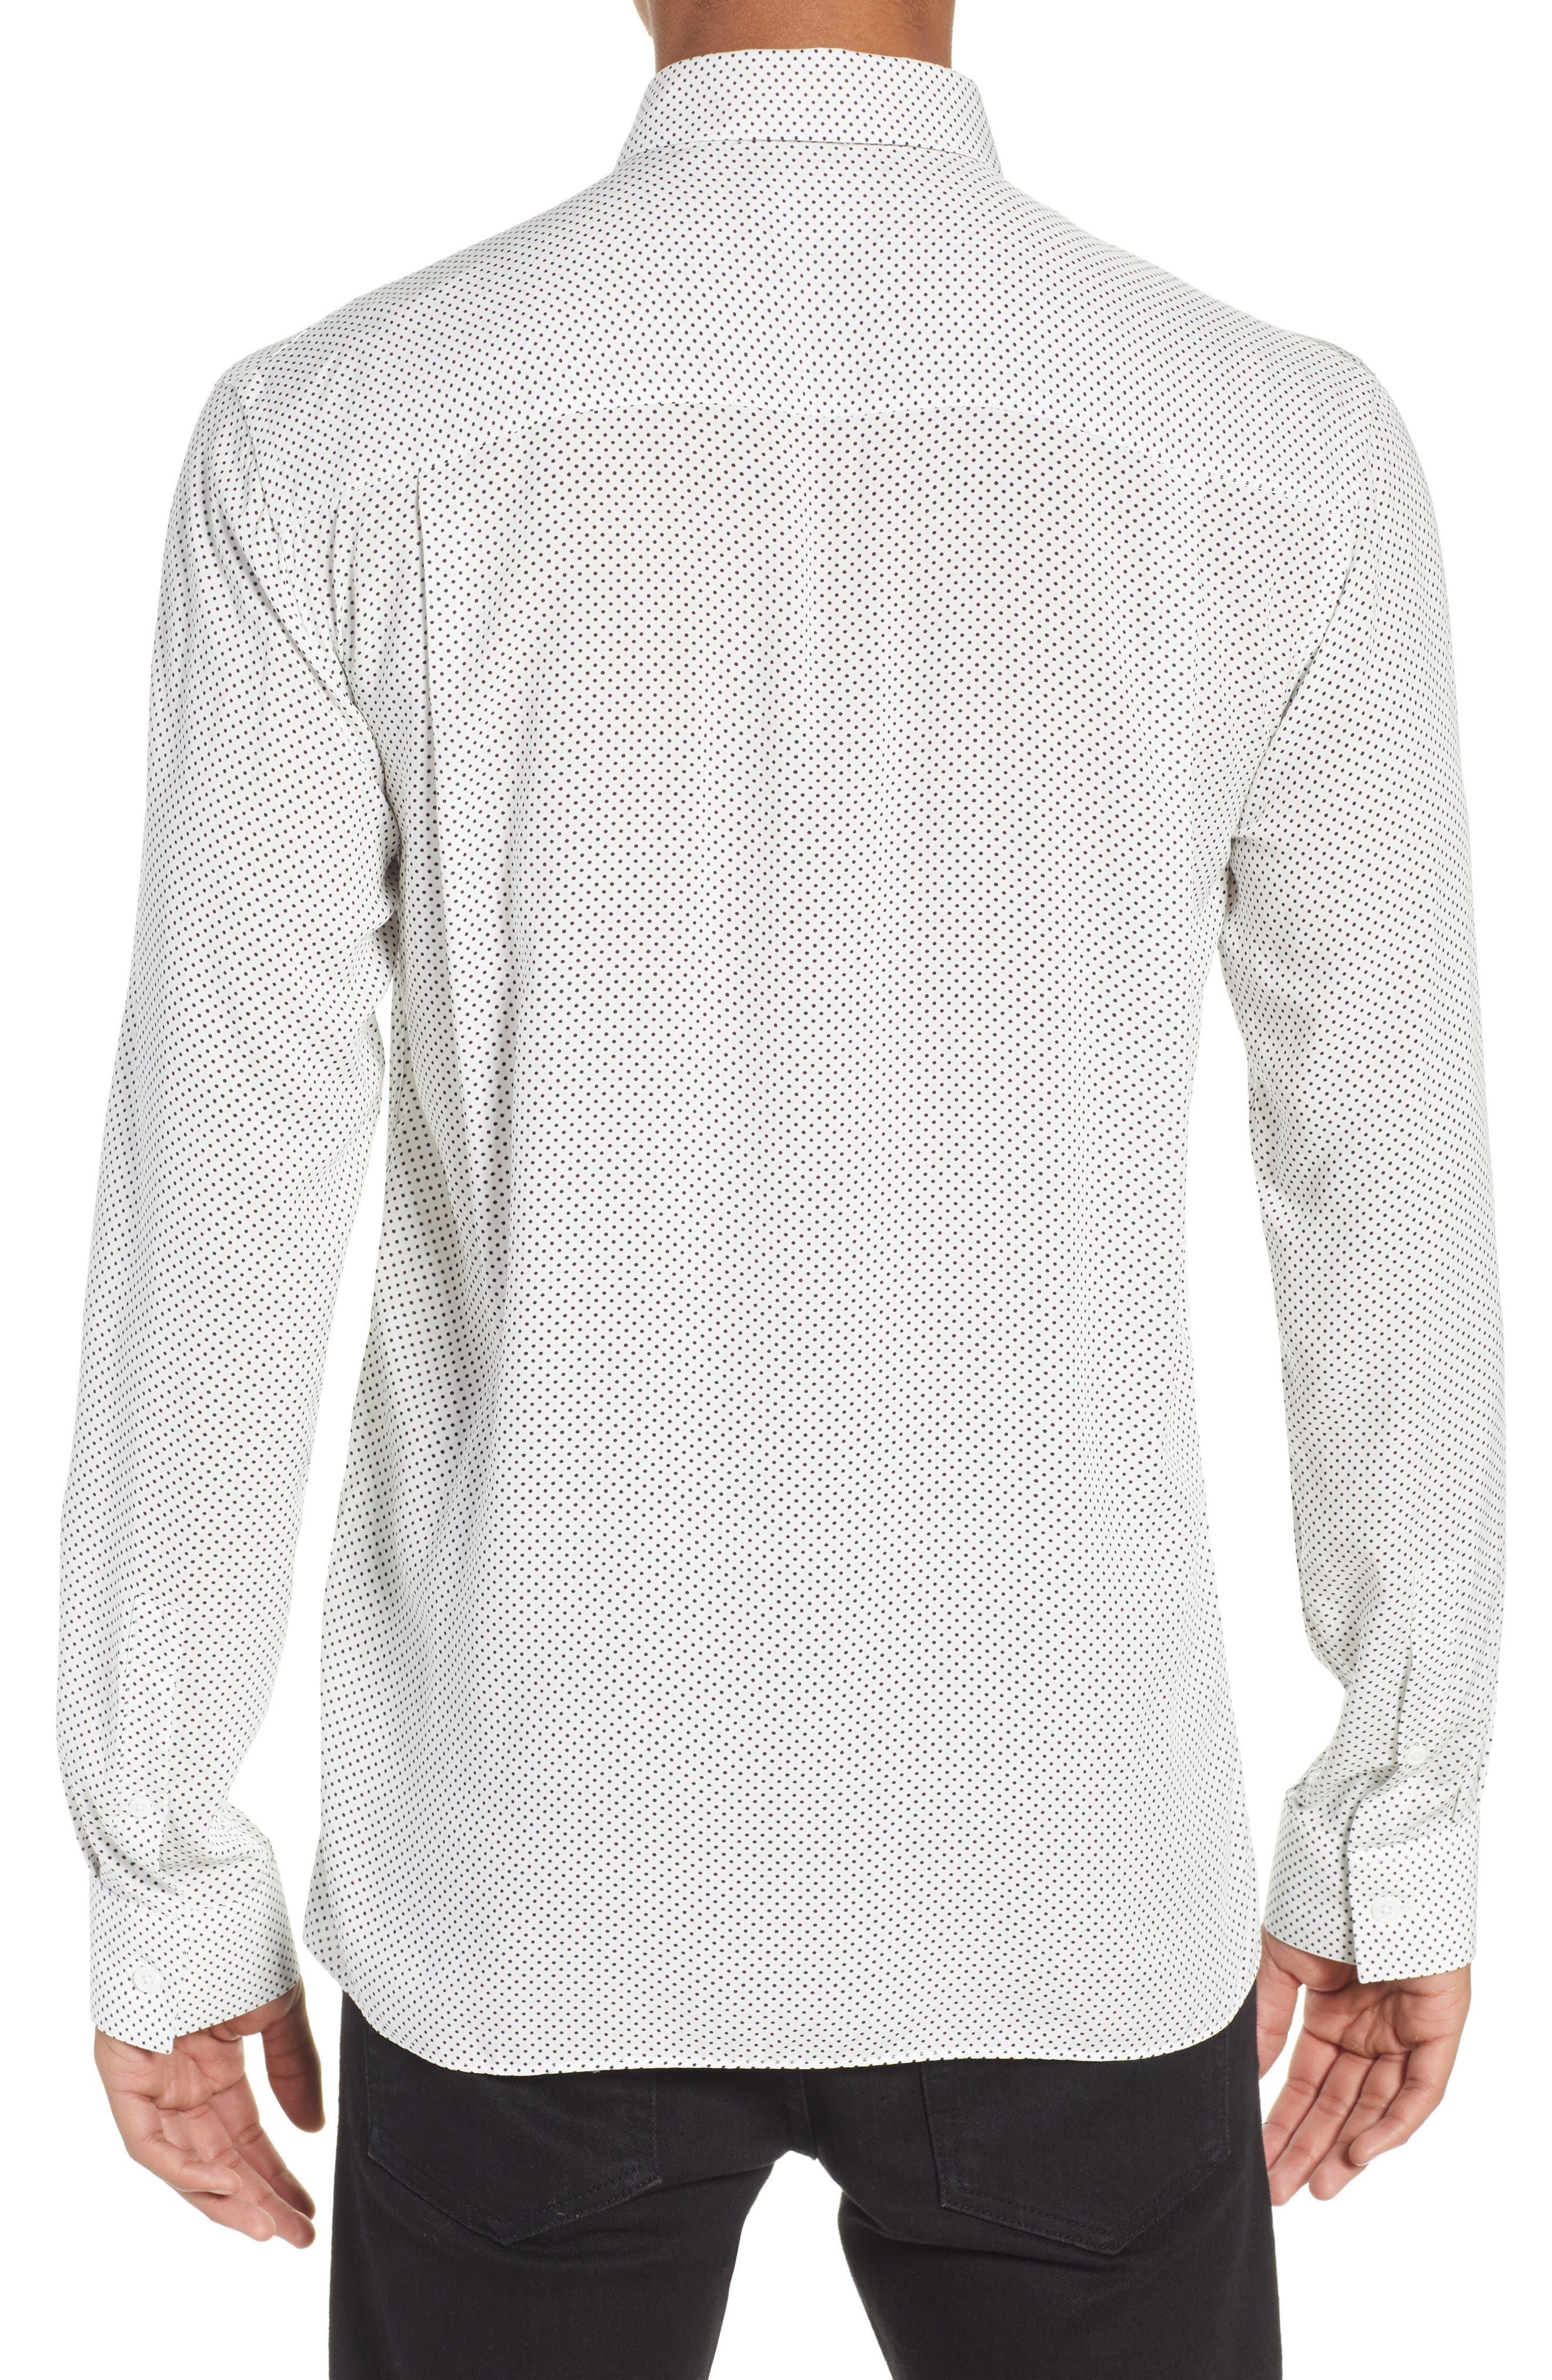 THE KOOPLES, Dot Print Sport Shirt, Alternate thumbnail 3, color, BEIGE-BLACK